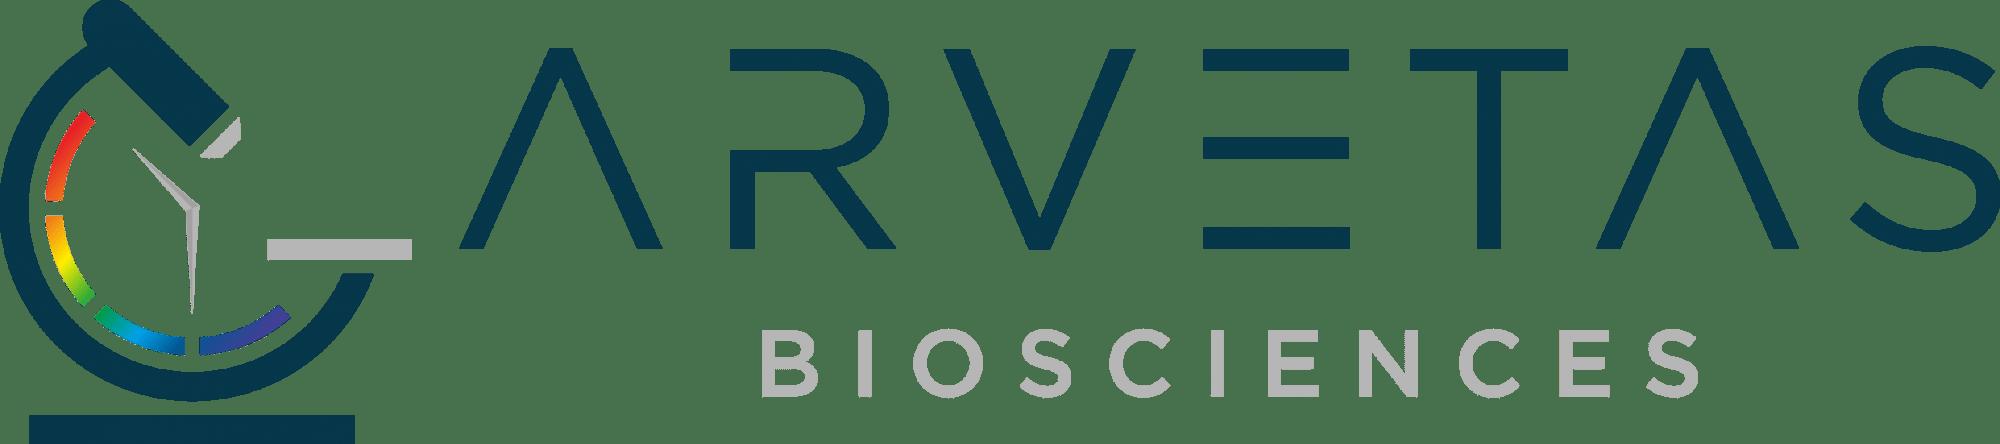 Arvetas Biosciences